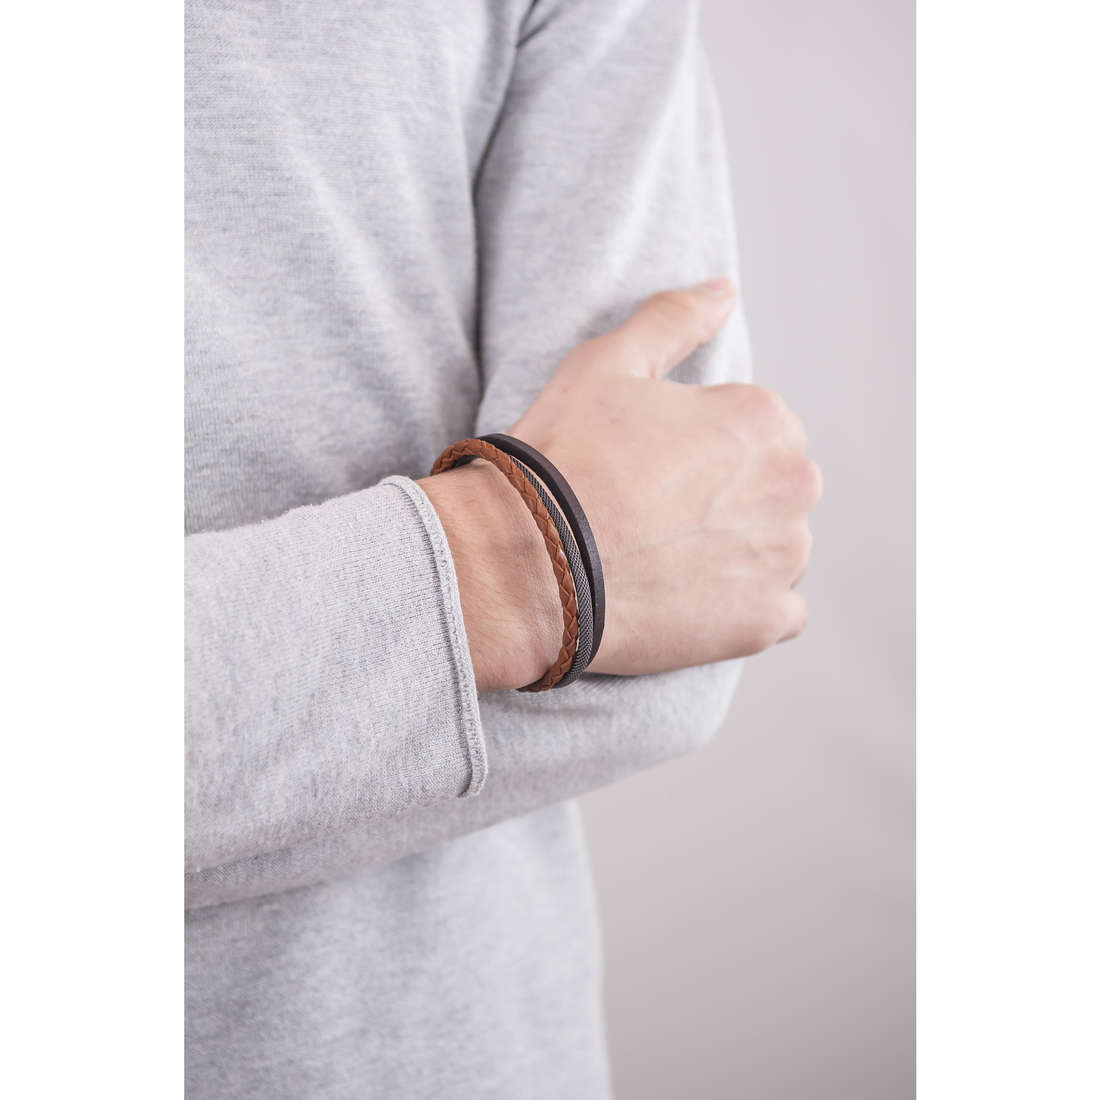 Fossil bracciali Spring 16 uomo JF02213040 indosso